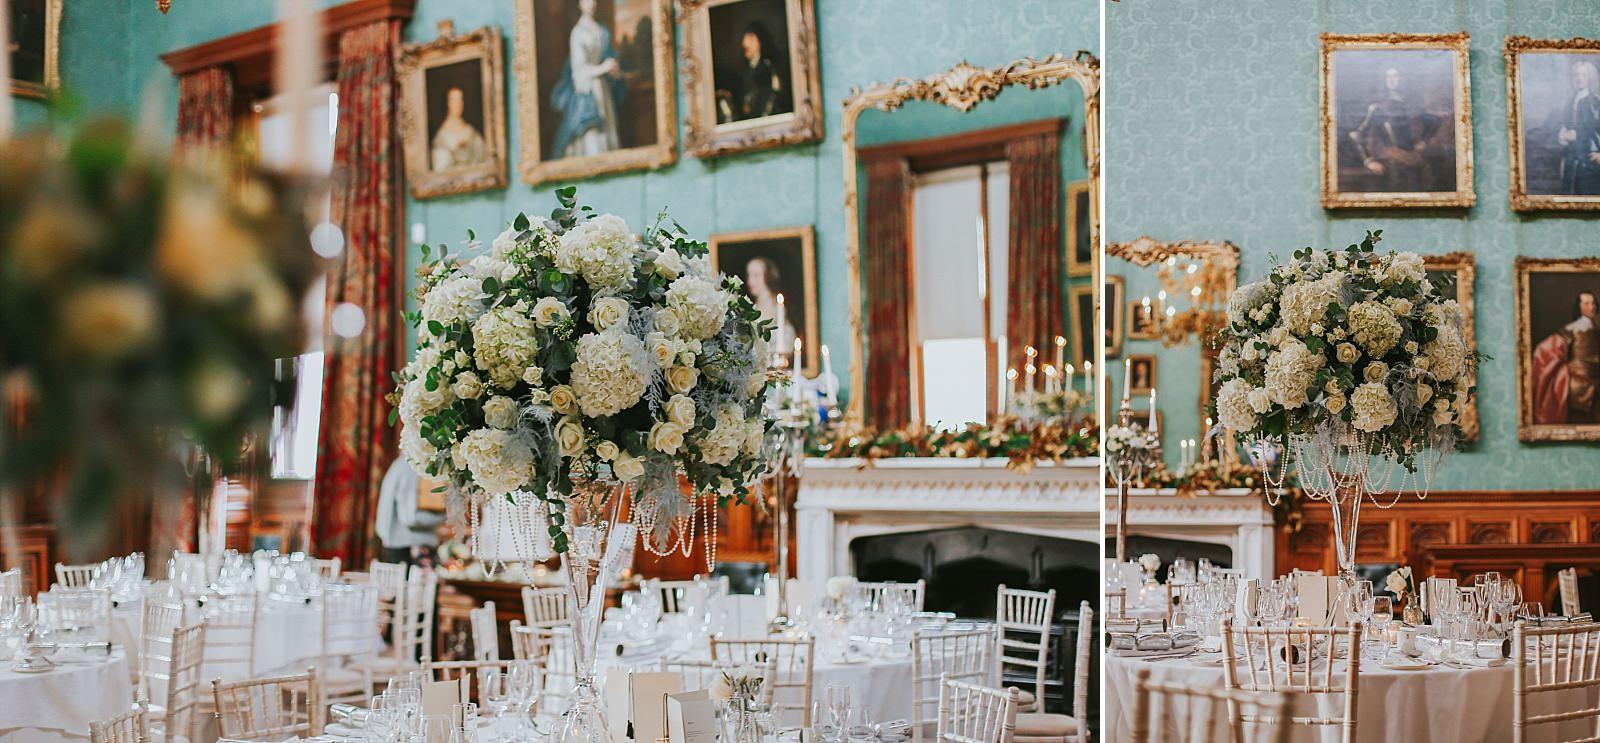 Hydrangea & White Rose flower centre piece for a wedding